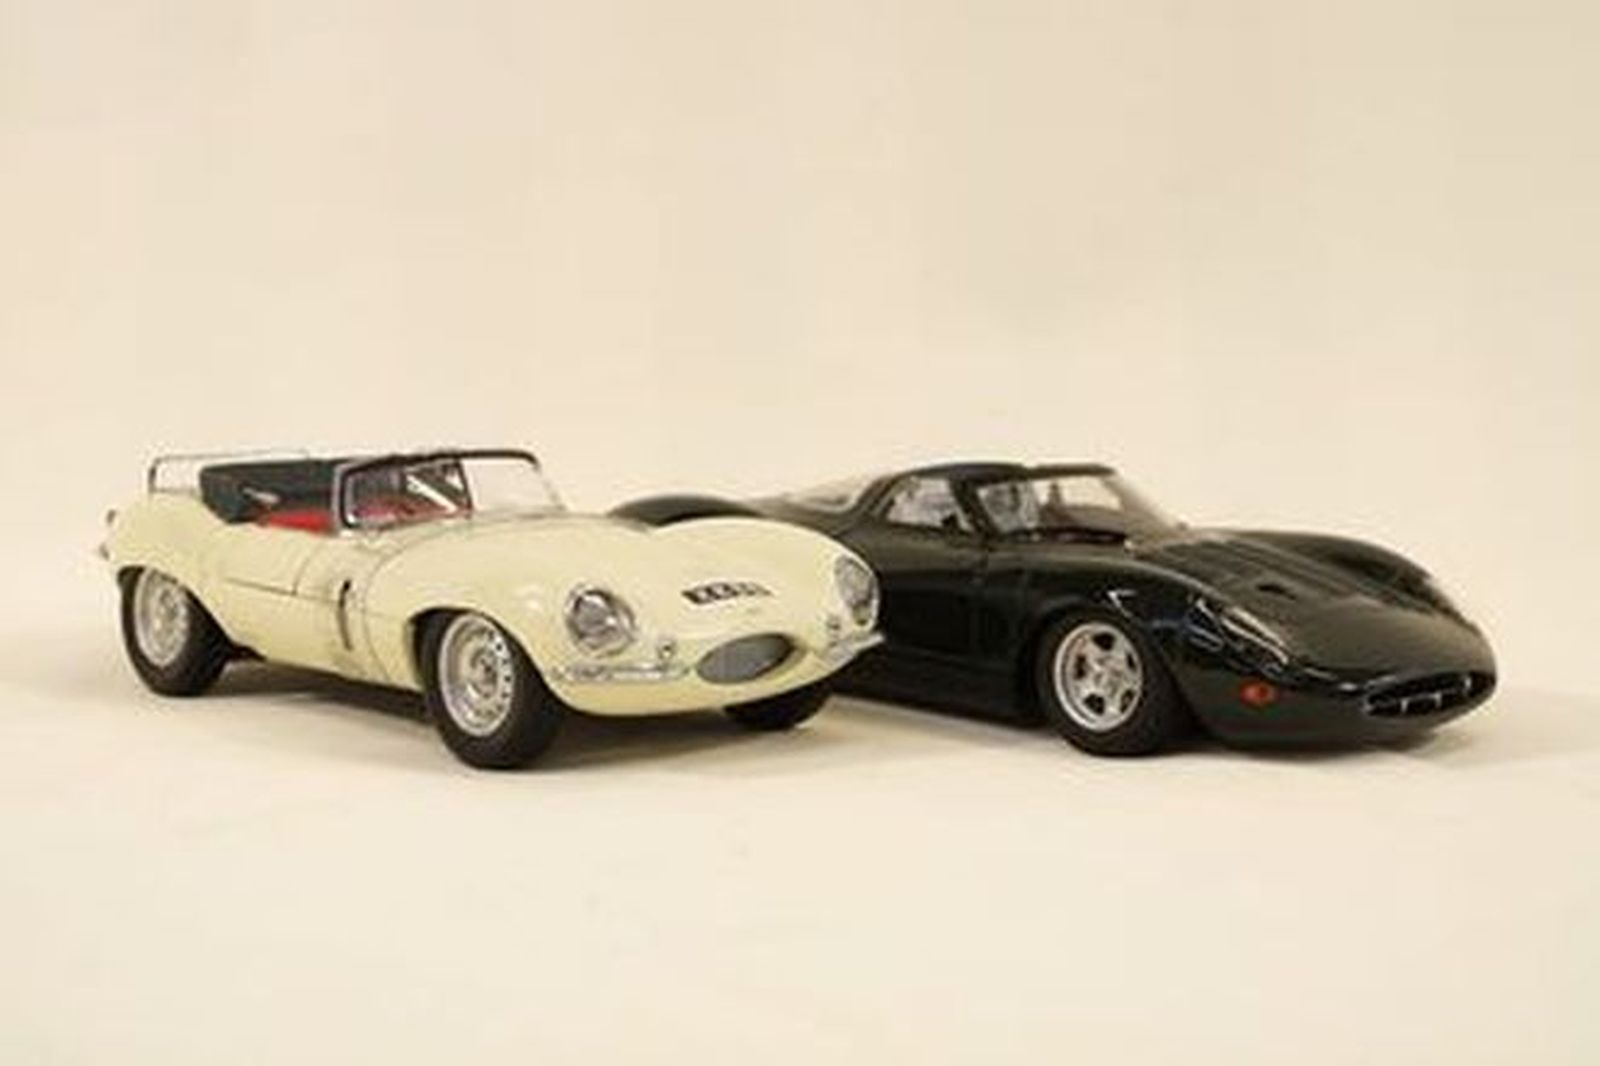 Model Cars x 2 - Autoart Jaguar XKSS Cream & Jaguar XK13 BRG (1:18 scale)